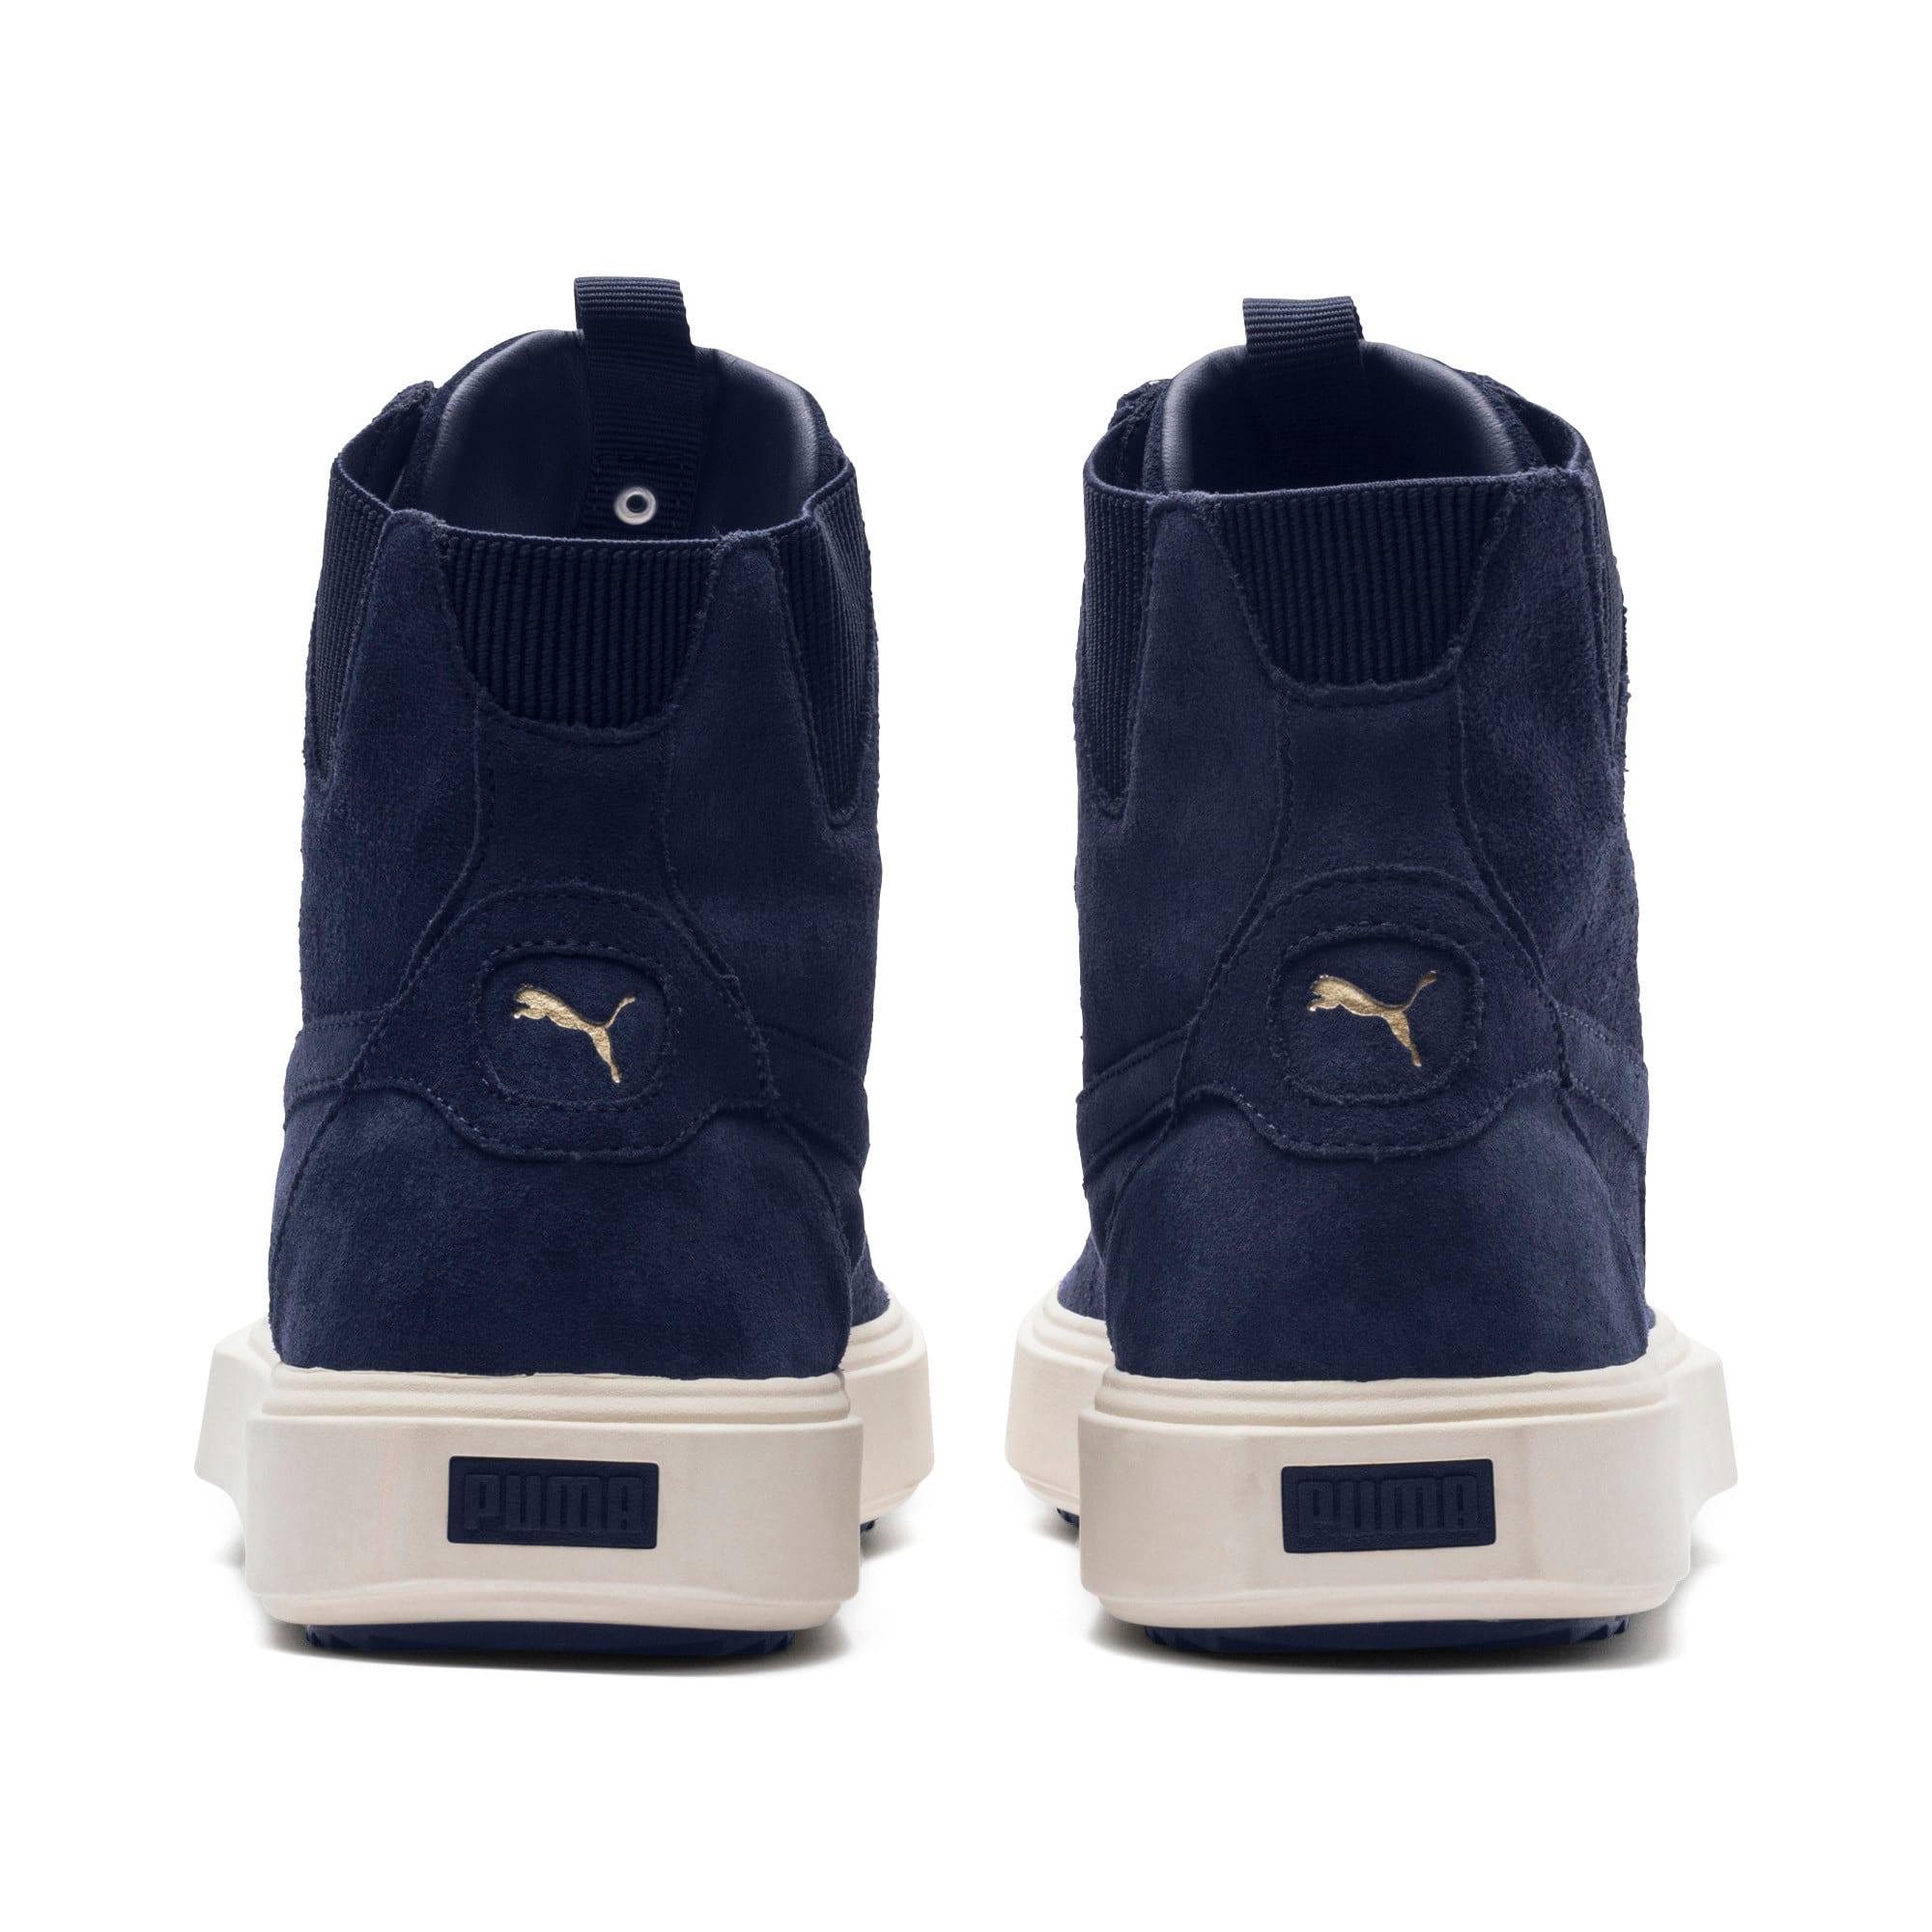 Thumbnail 4 of PUMA Breaker Hi Evolution Sneakers, Peacoat-Whisper White, medium